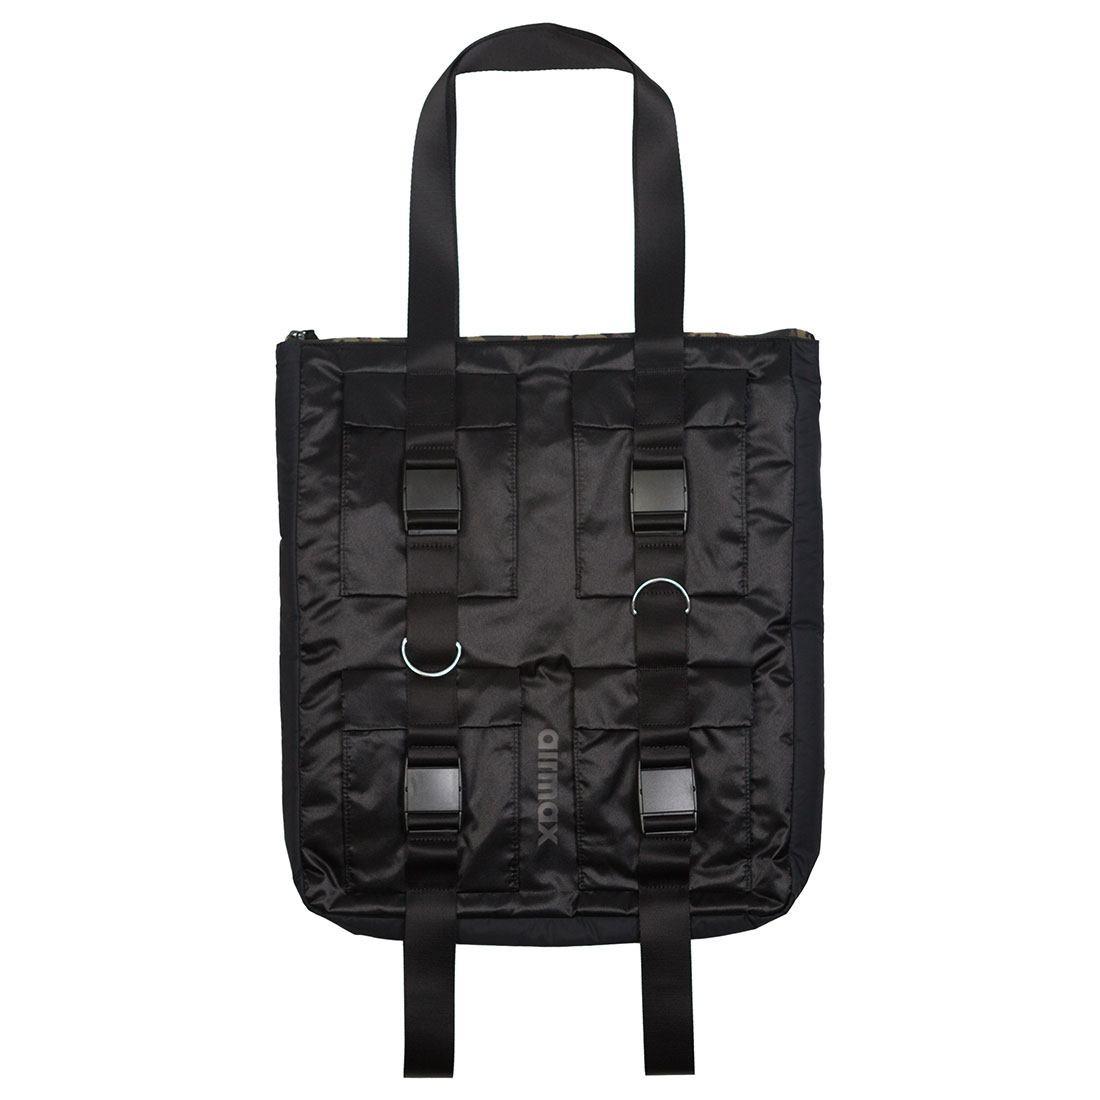 Nike Men Nk Airmax Tote - Floral Camo (black) 1S